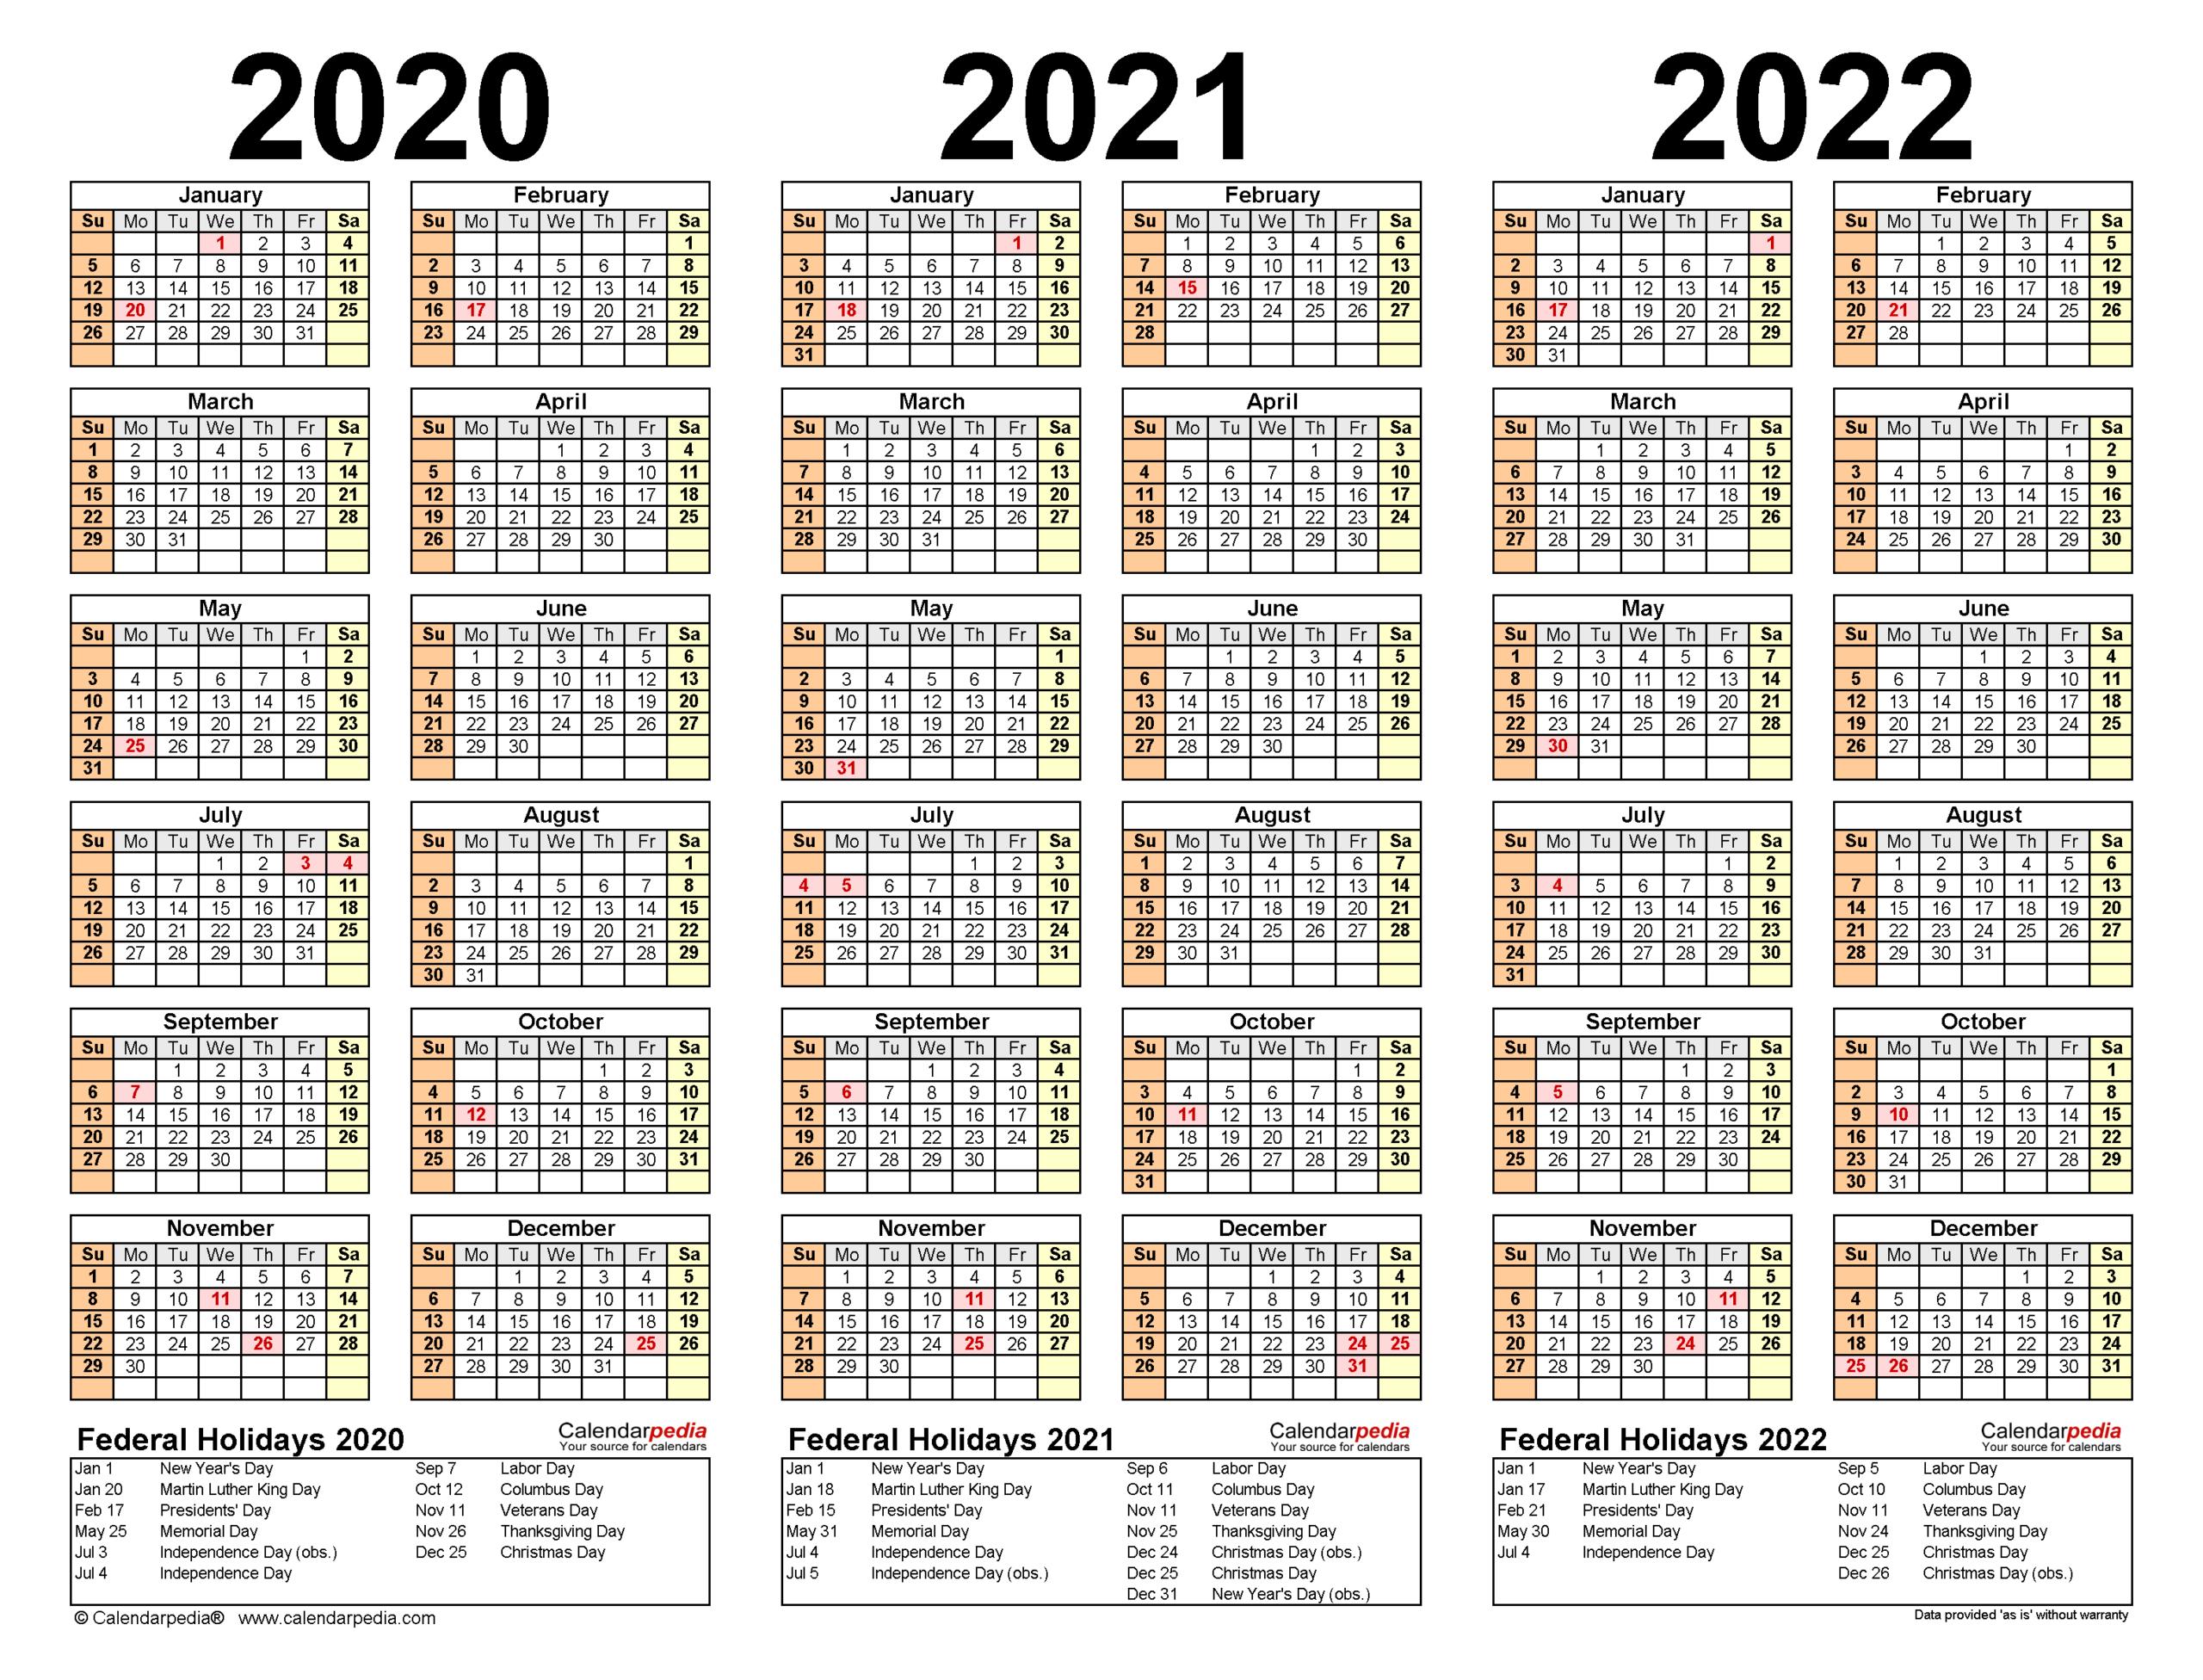 Uri Calendar 2022.2020 2022 Three Year Calendar Free Printable Excel Templates Pertaining To 2021 2022 Thr In 2021 Calendar Printables Yearly Calendar Template Free Printable Calendar